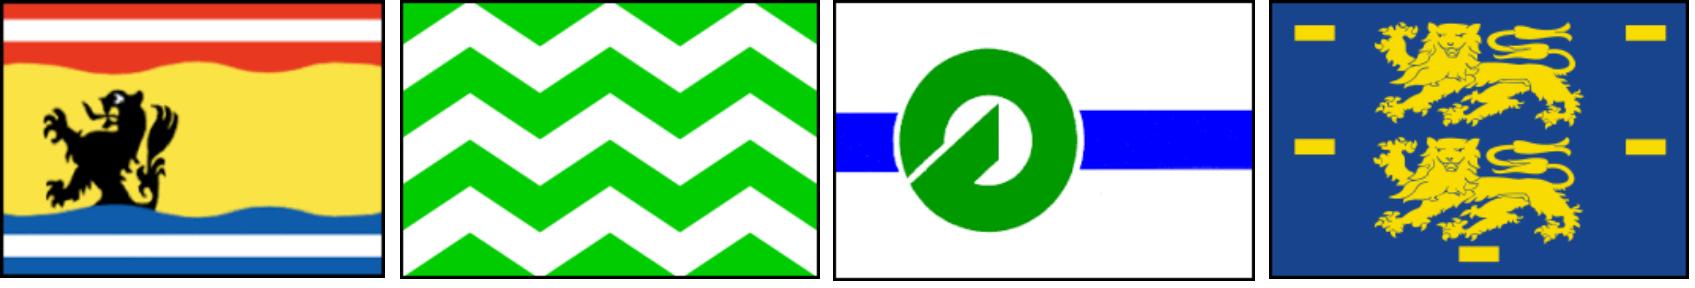 achterhoek streekvlaggen